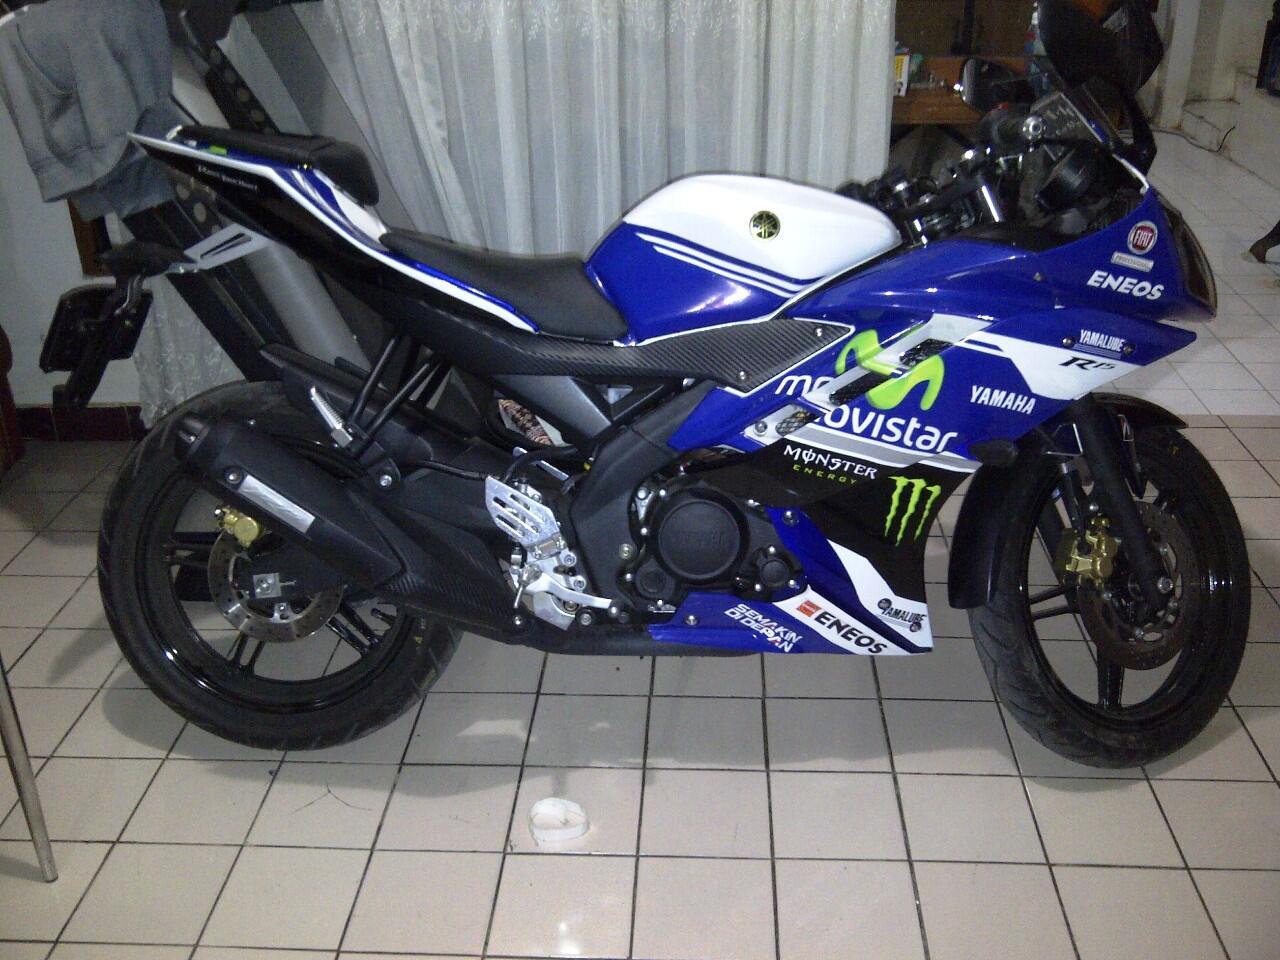 Yamaha R15 Kaskus Rider Community Page 373 Prospeed Mf Series Vixion Old Full R15er